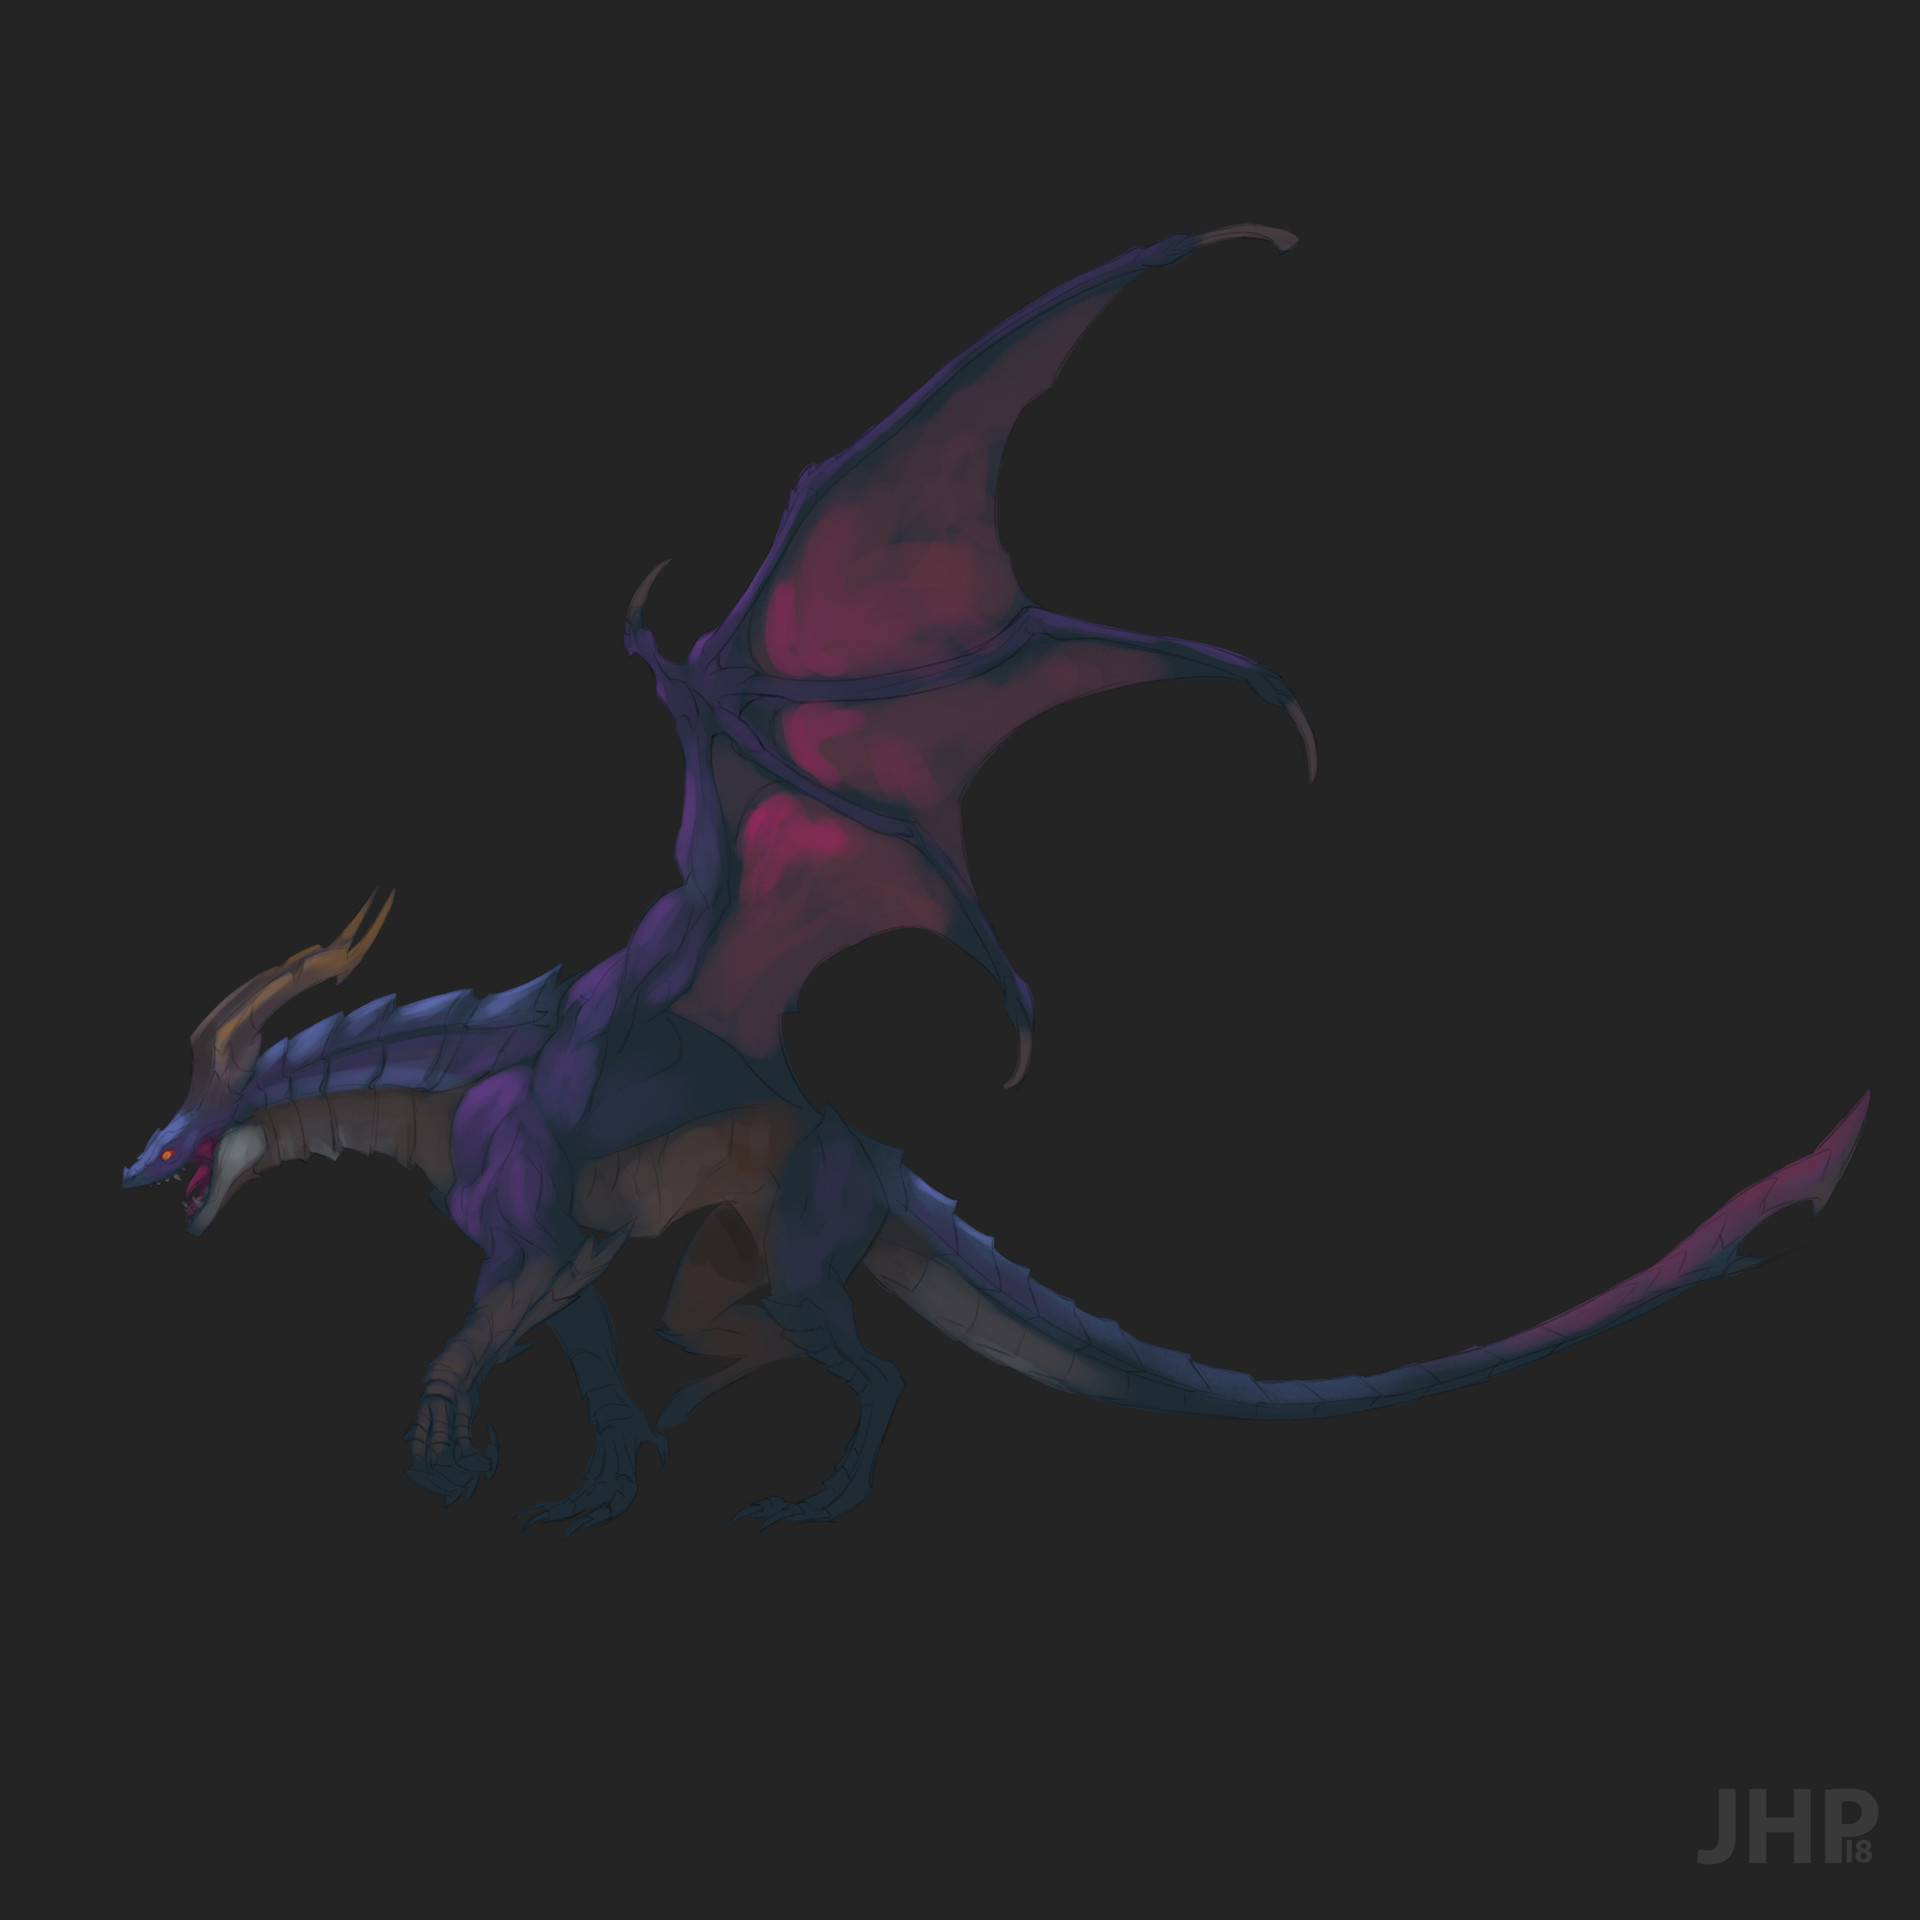 Joao henrique pacheco dragon p 3